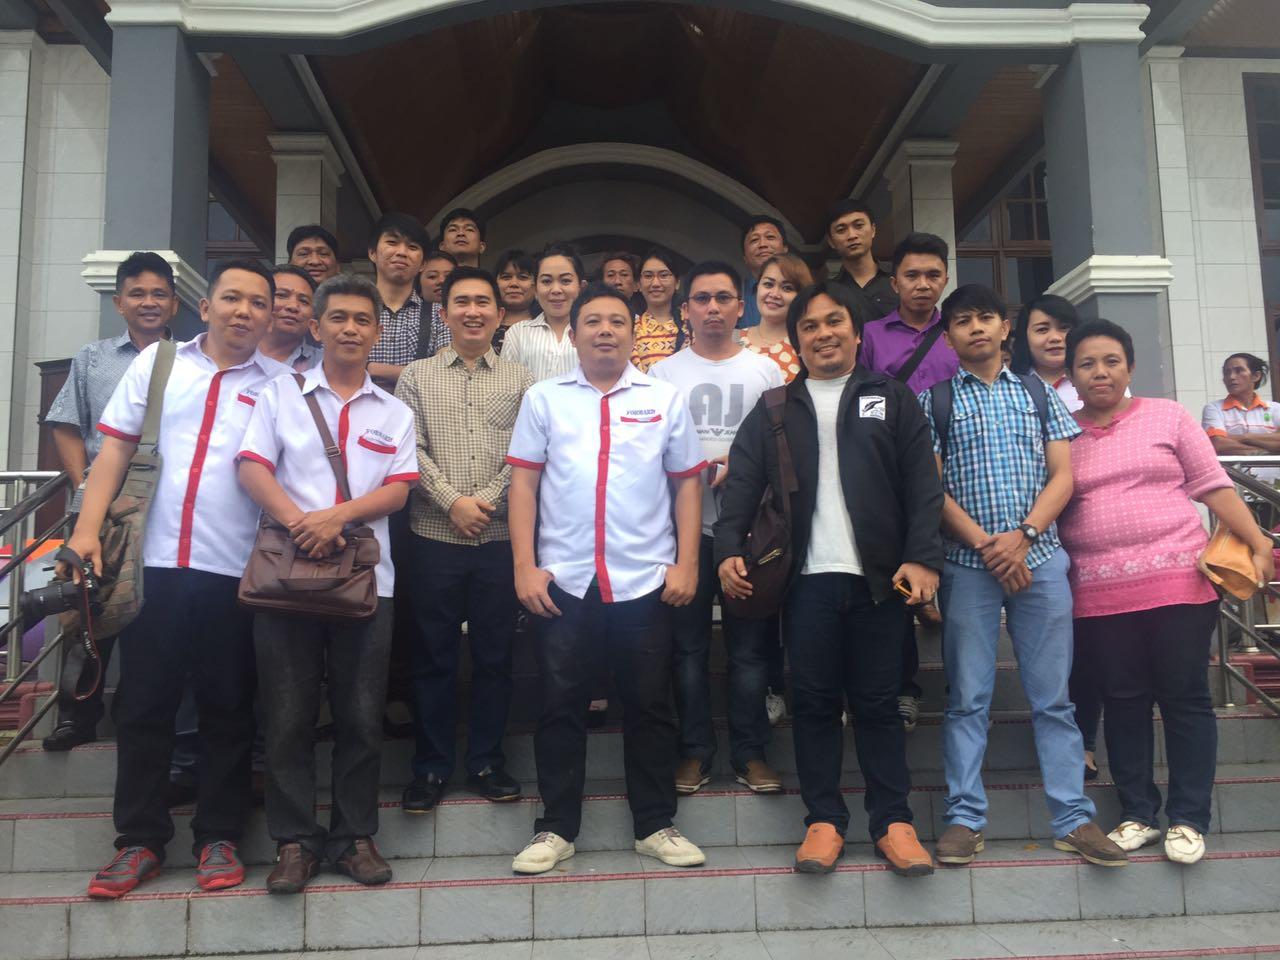 Ibadah Natal Bersama Anak-anak Pemulung, Forward Gandeng KPA GMIM Getsemani Sumompo